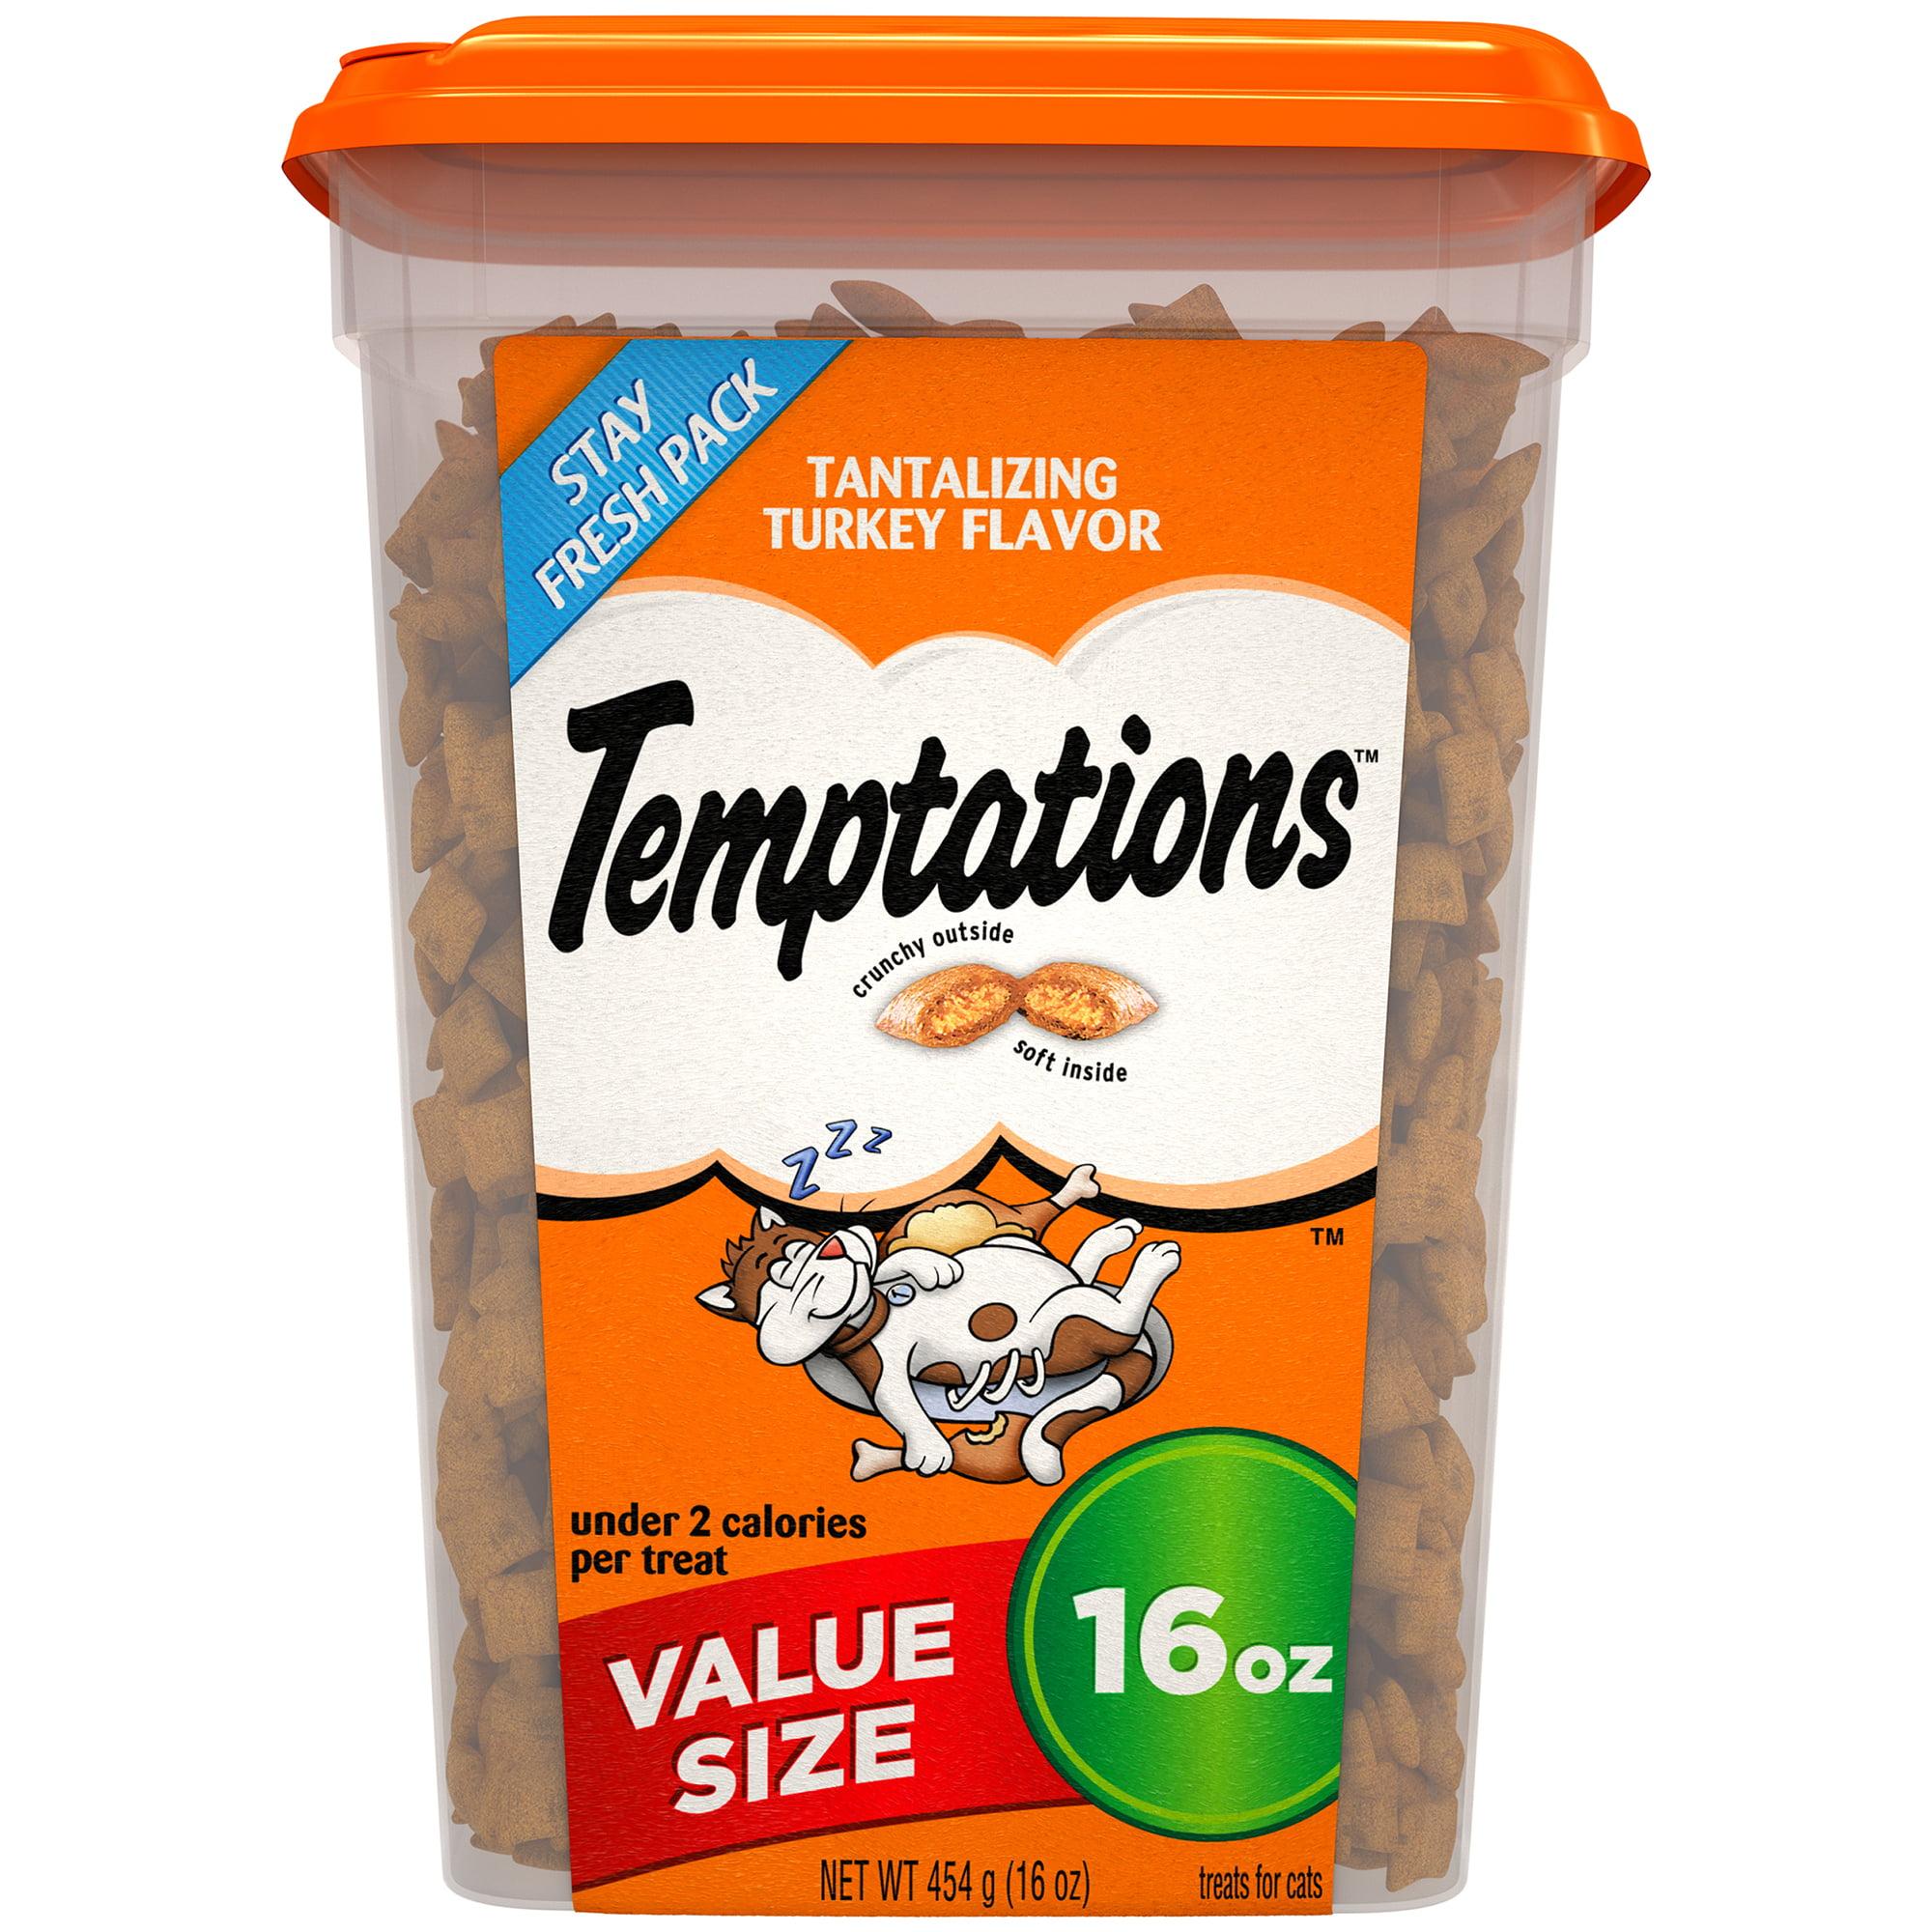 TEMPTATIONS Classic Treats for Cats Tantalizing Turkey Flavor, 16 oz. Tub